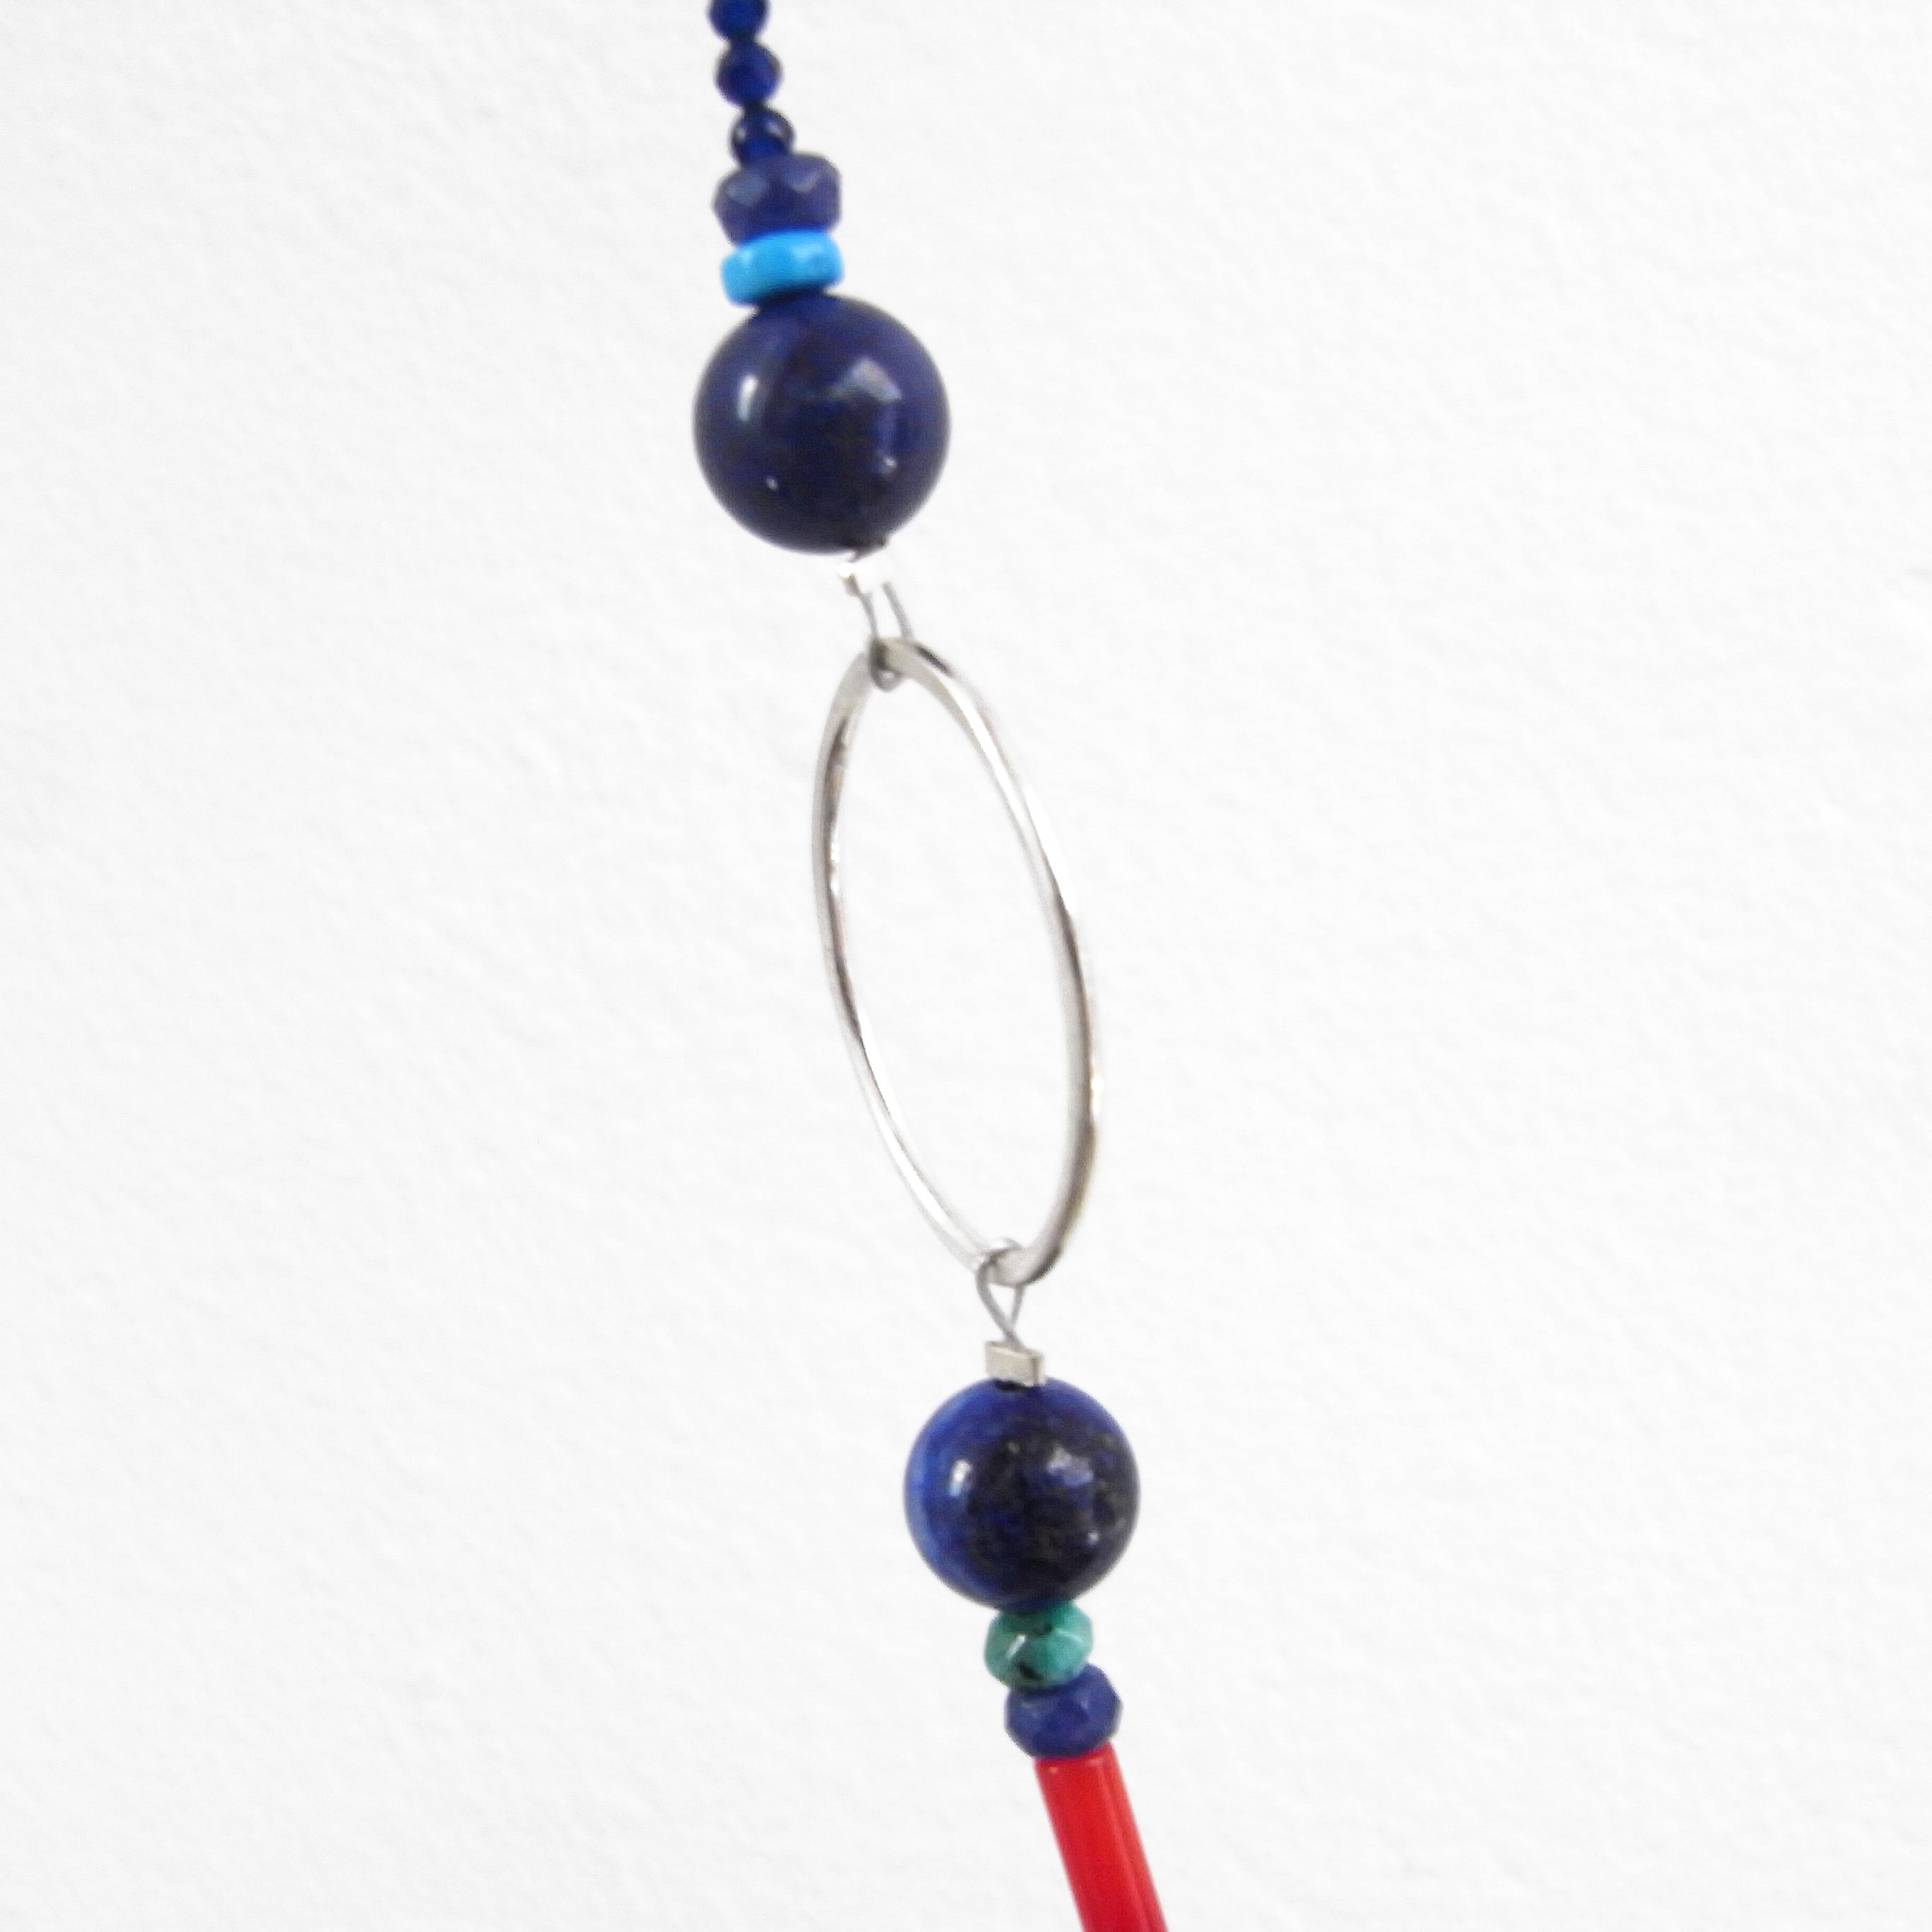 SALE - Semi Precious Bead Necklace